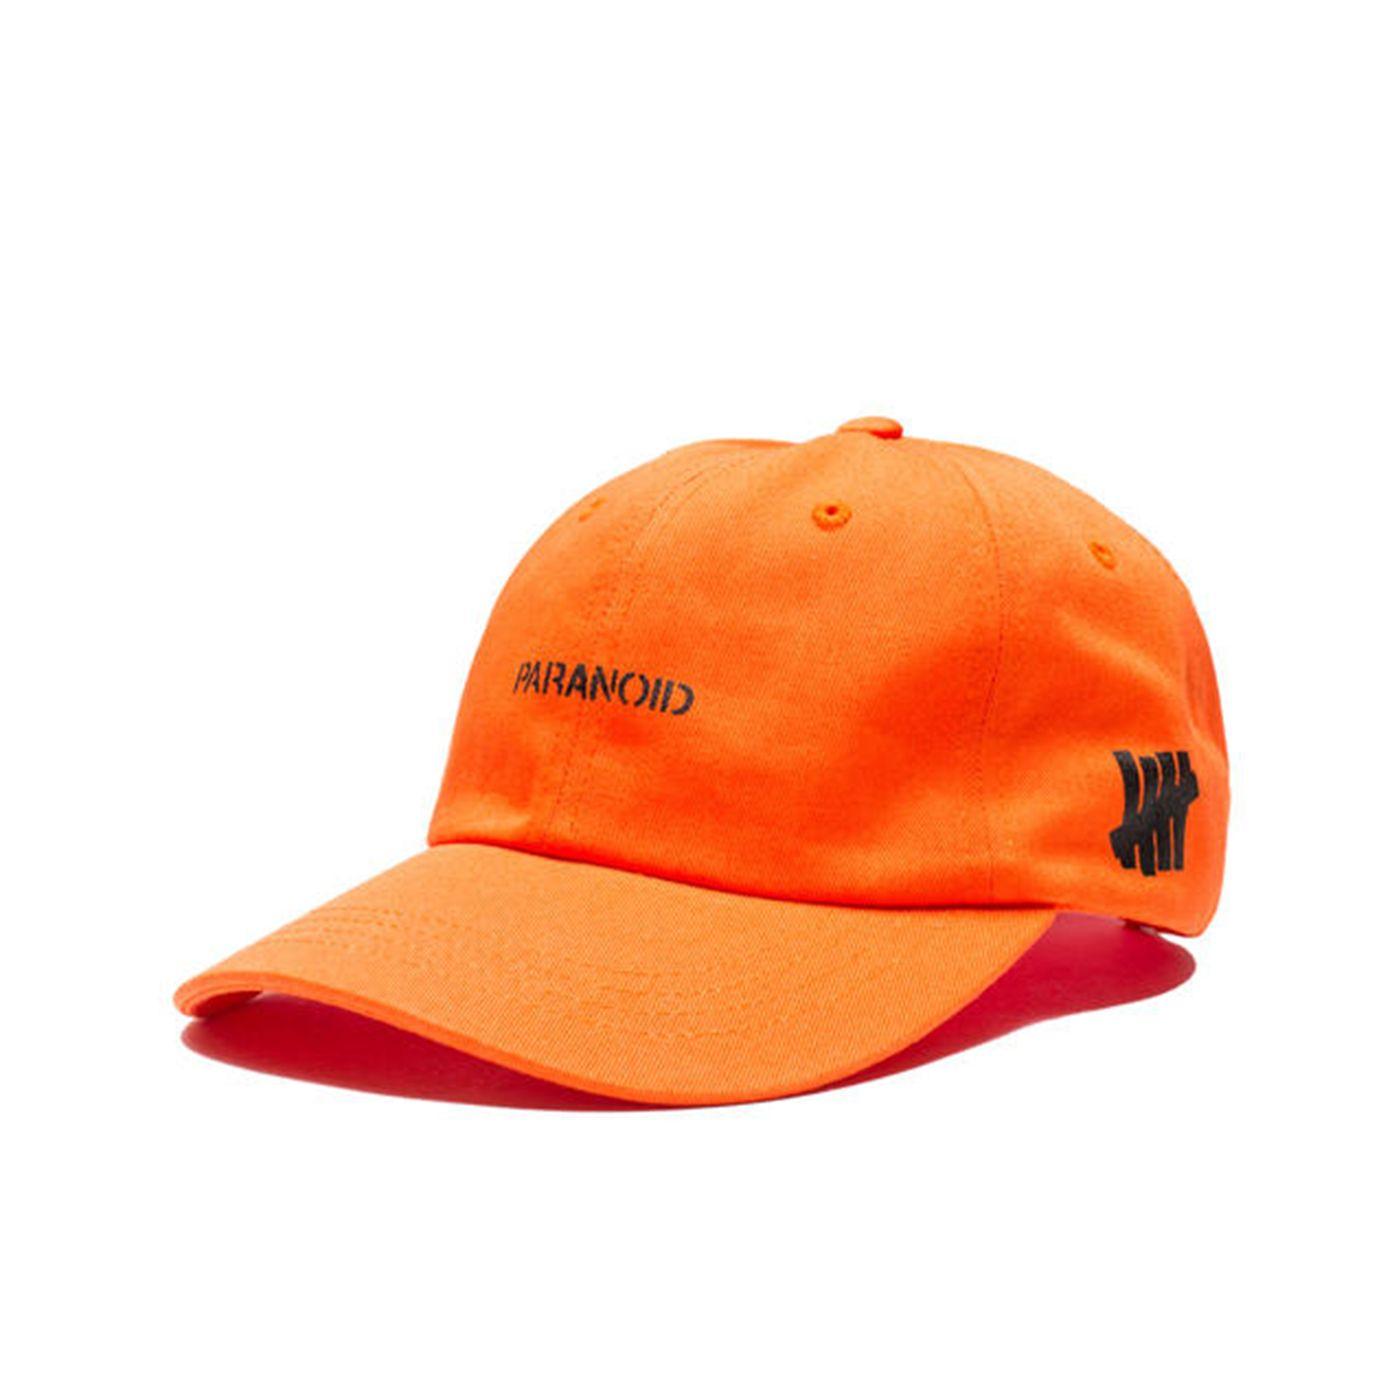 1b195ec80a1 Anti social social club x undefeated cap in orange (limited stock ...